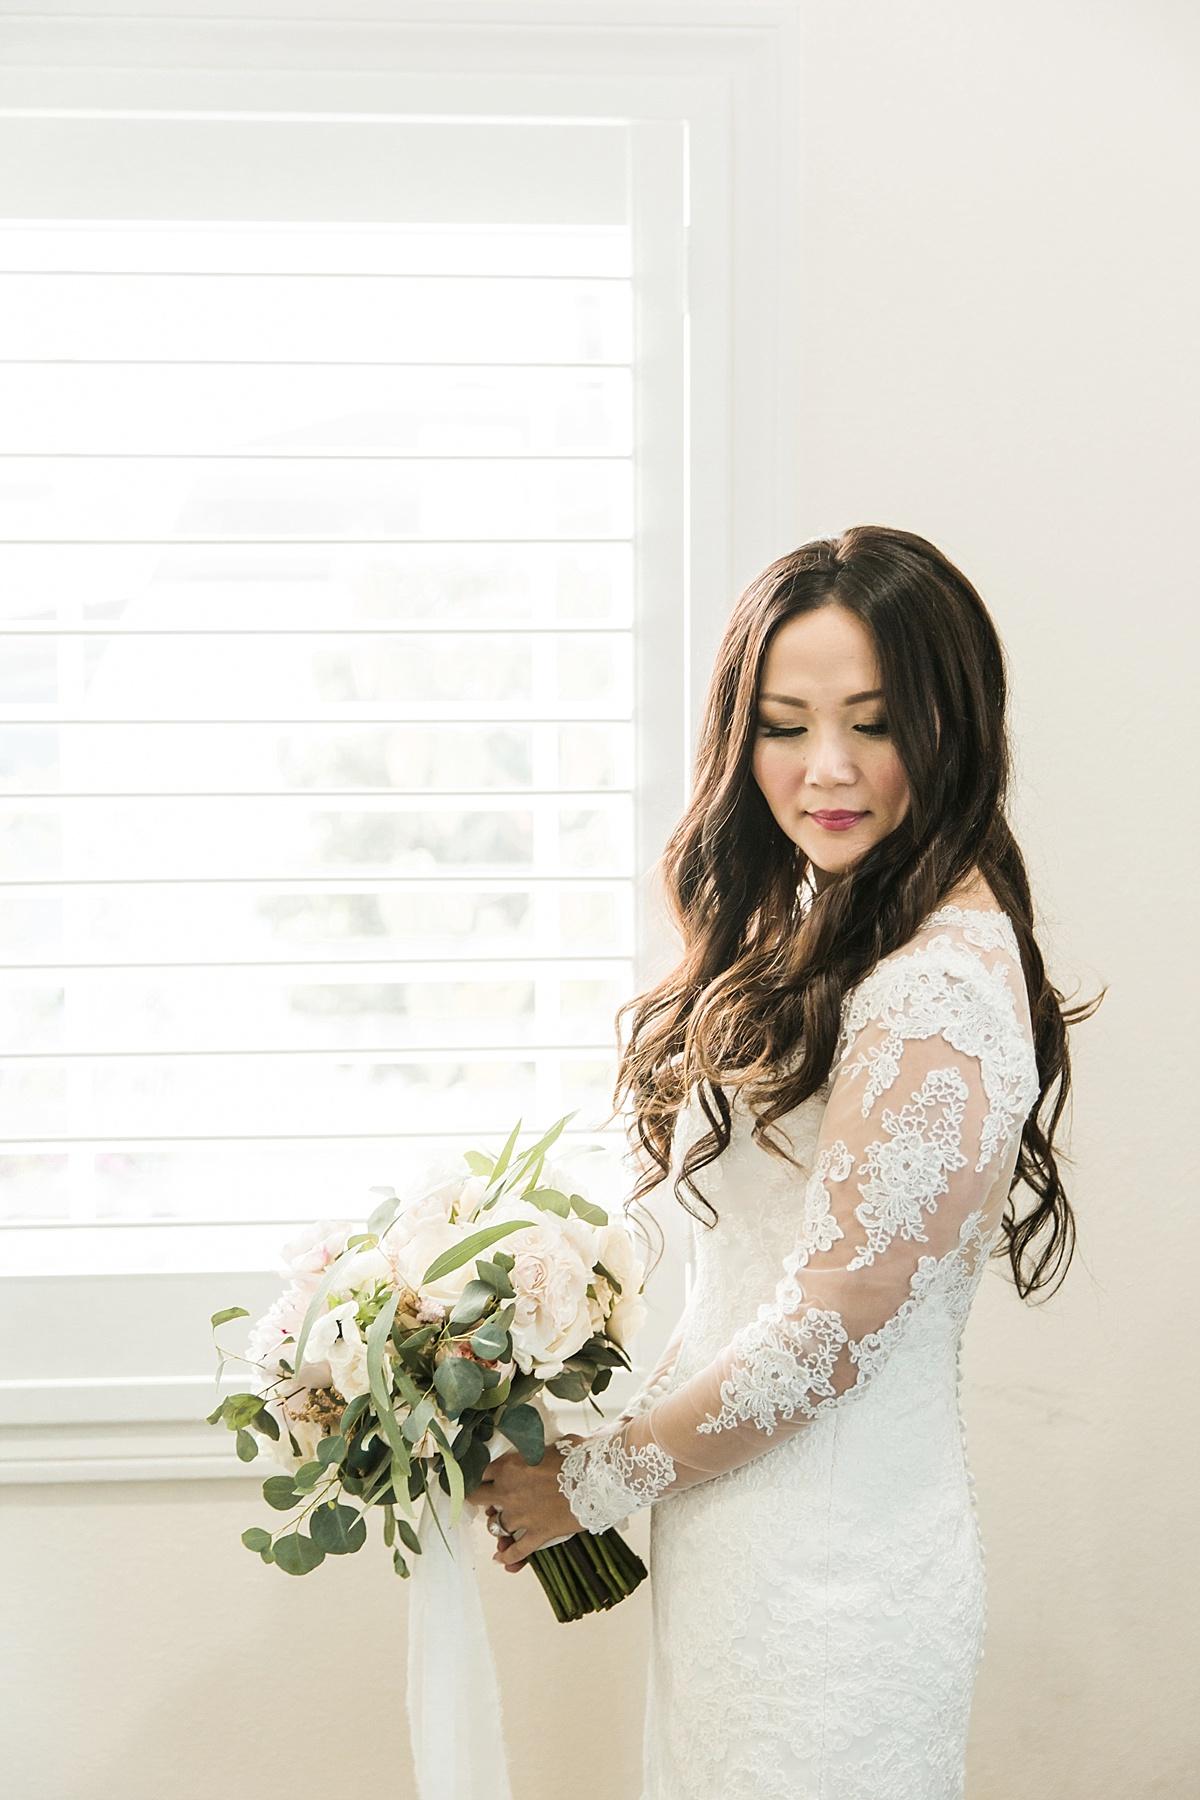 The-Venue-ByThree-Petals-Huntington-Beach-Wedding-Photographer-Christine-Andrew-Carissa-Woo-Photography_0031.jpg